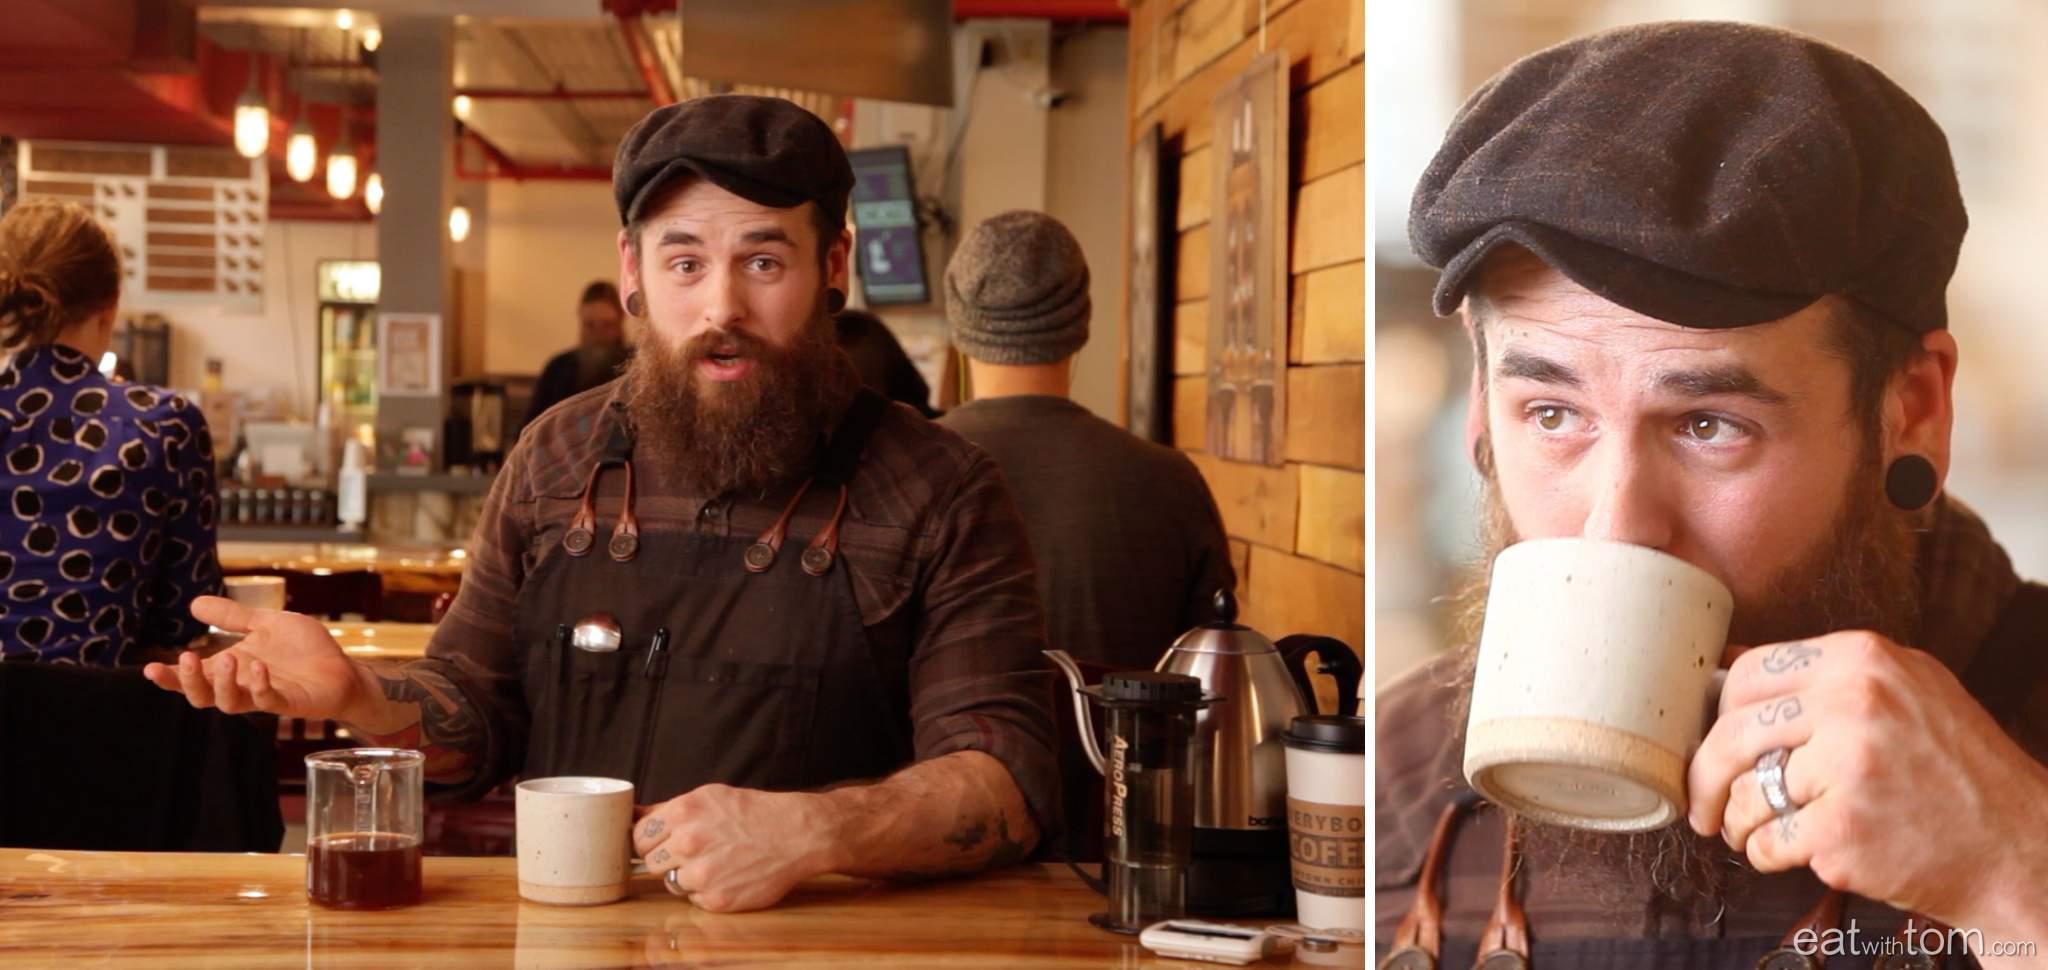 Coffee Expert Josh in Chicago, inverted aeropress instructions